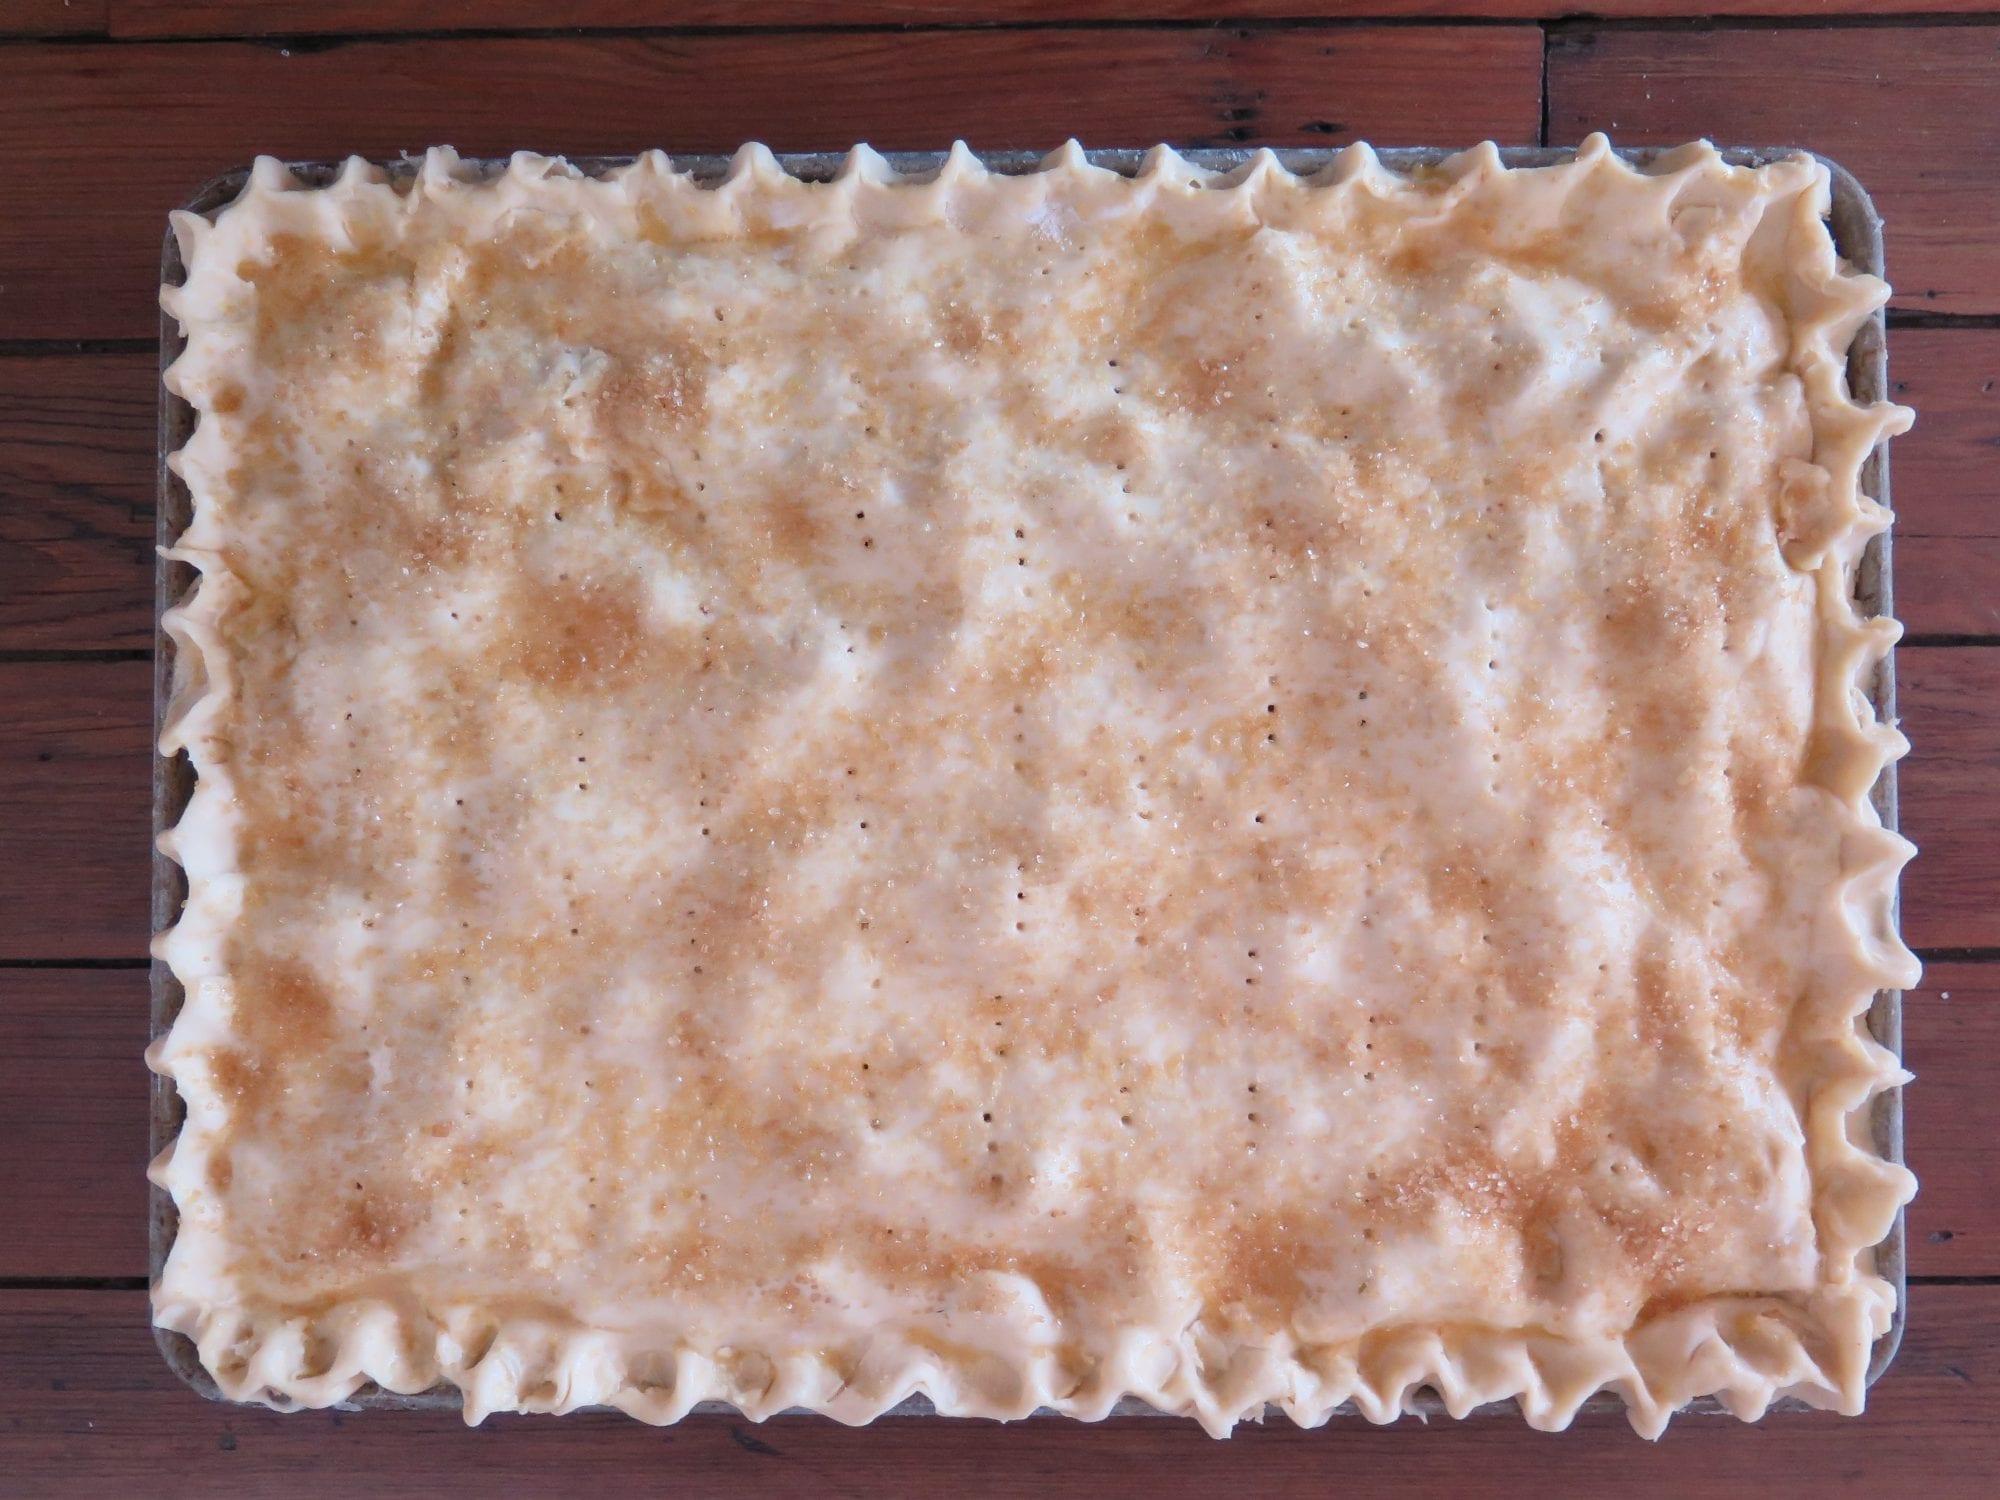 pre-baked apple sour cherry slab pie